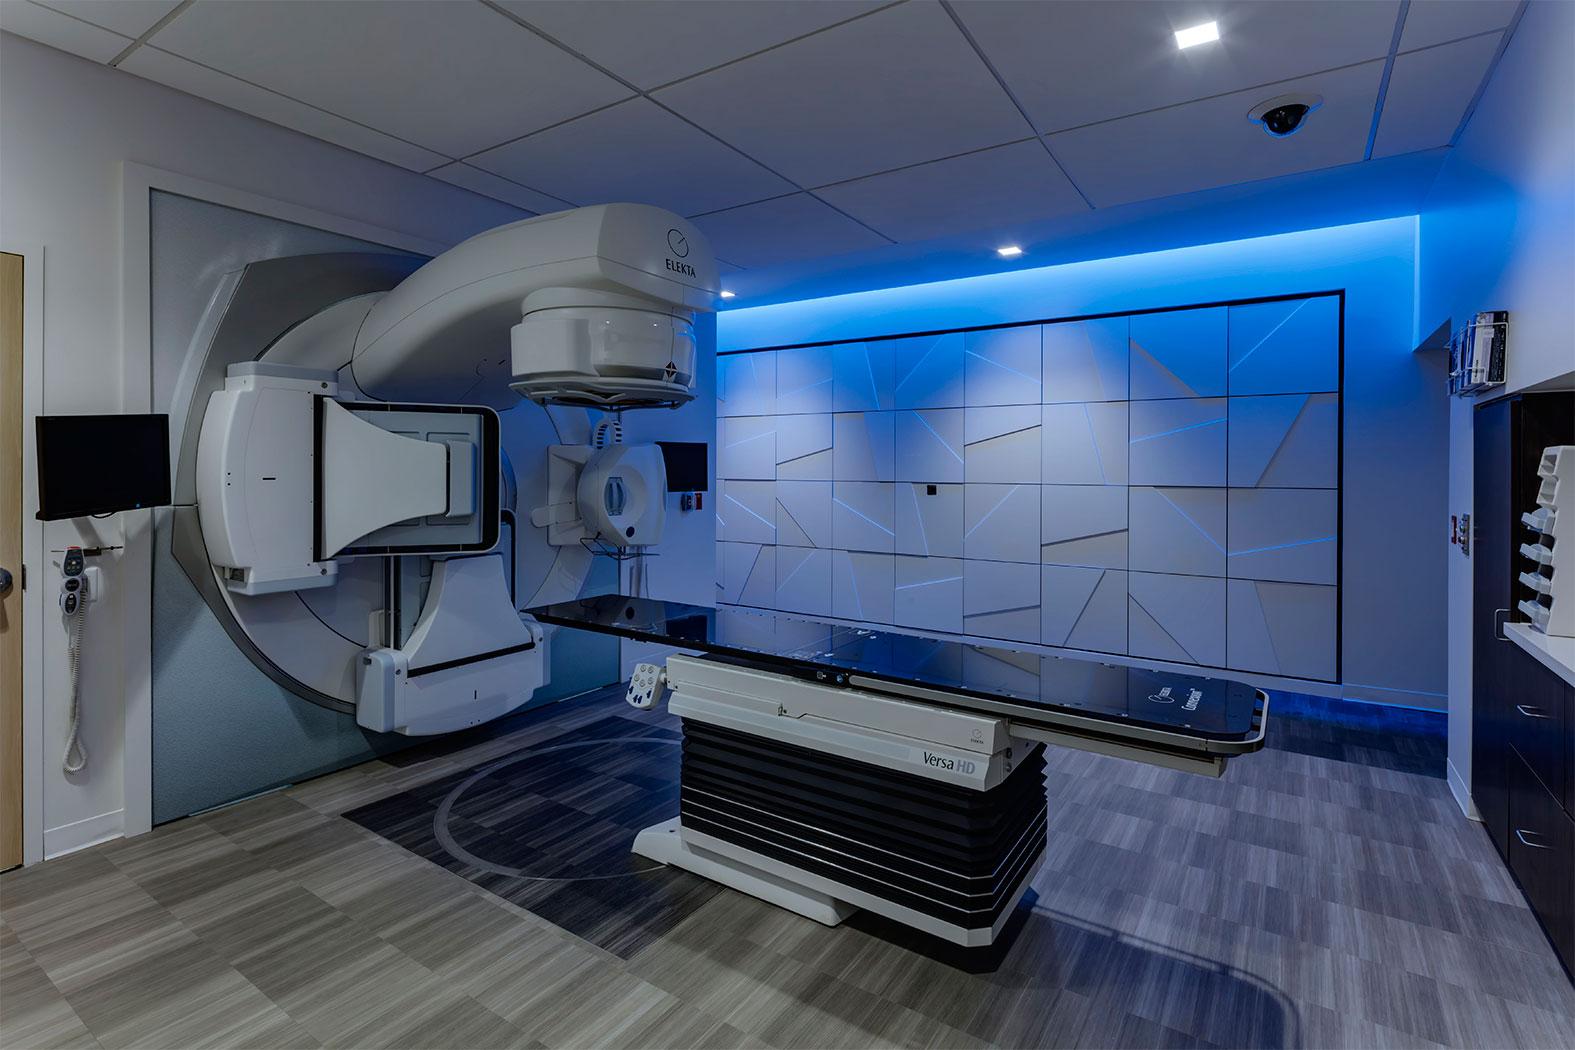 UT Southwestern Medical Center opens new radiation oncology